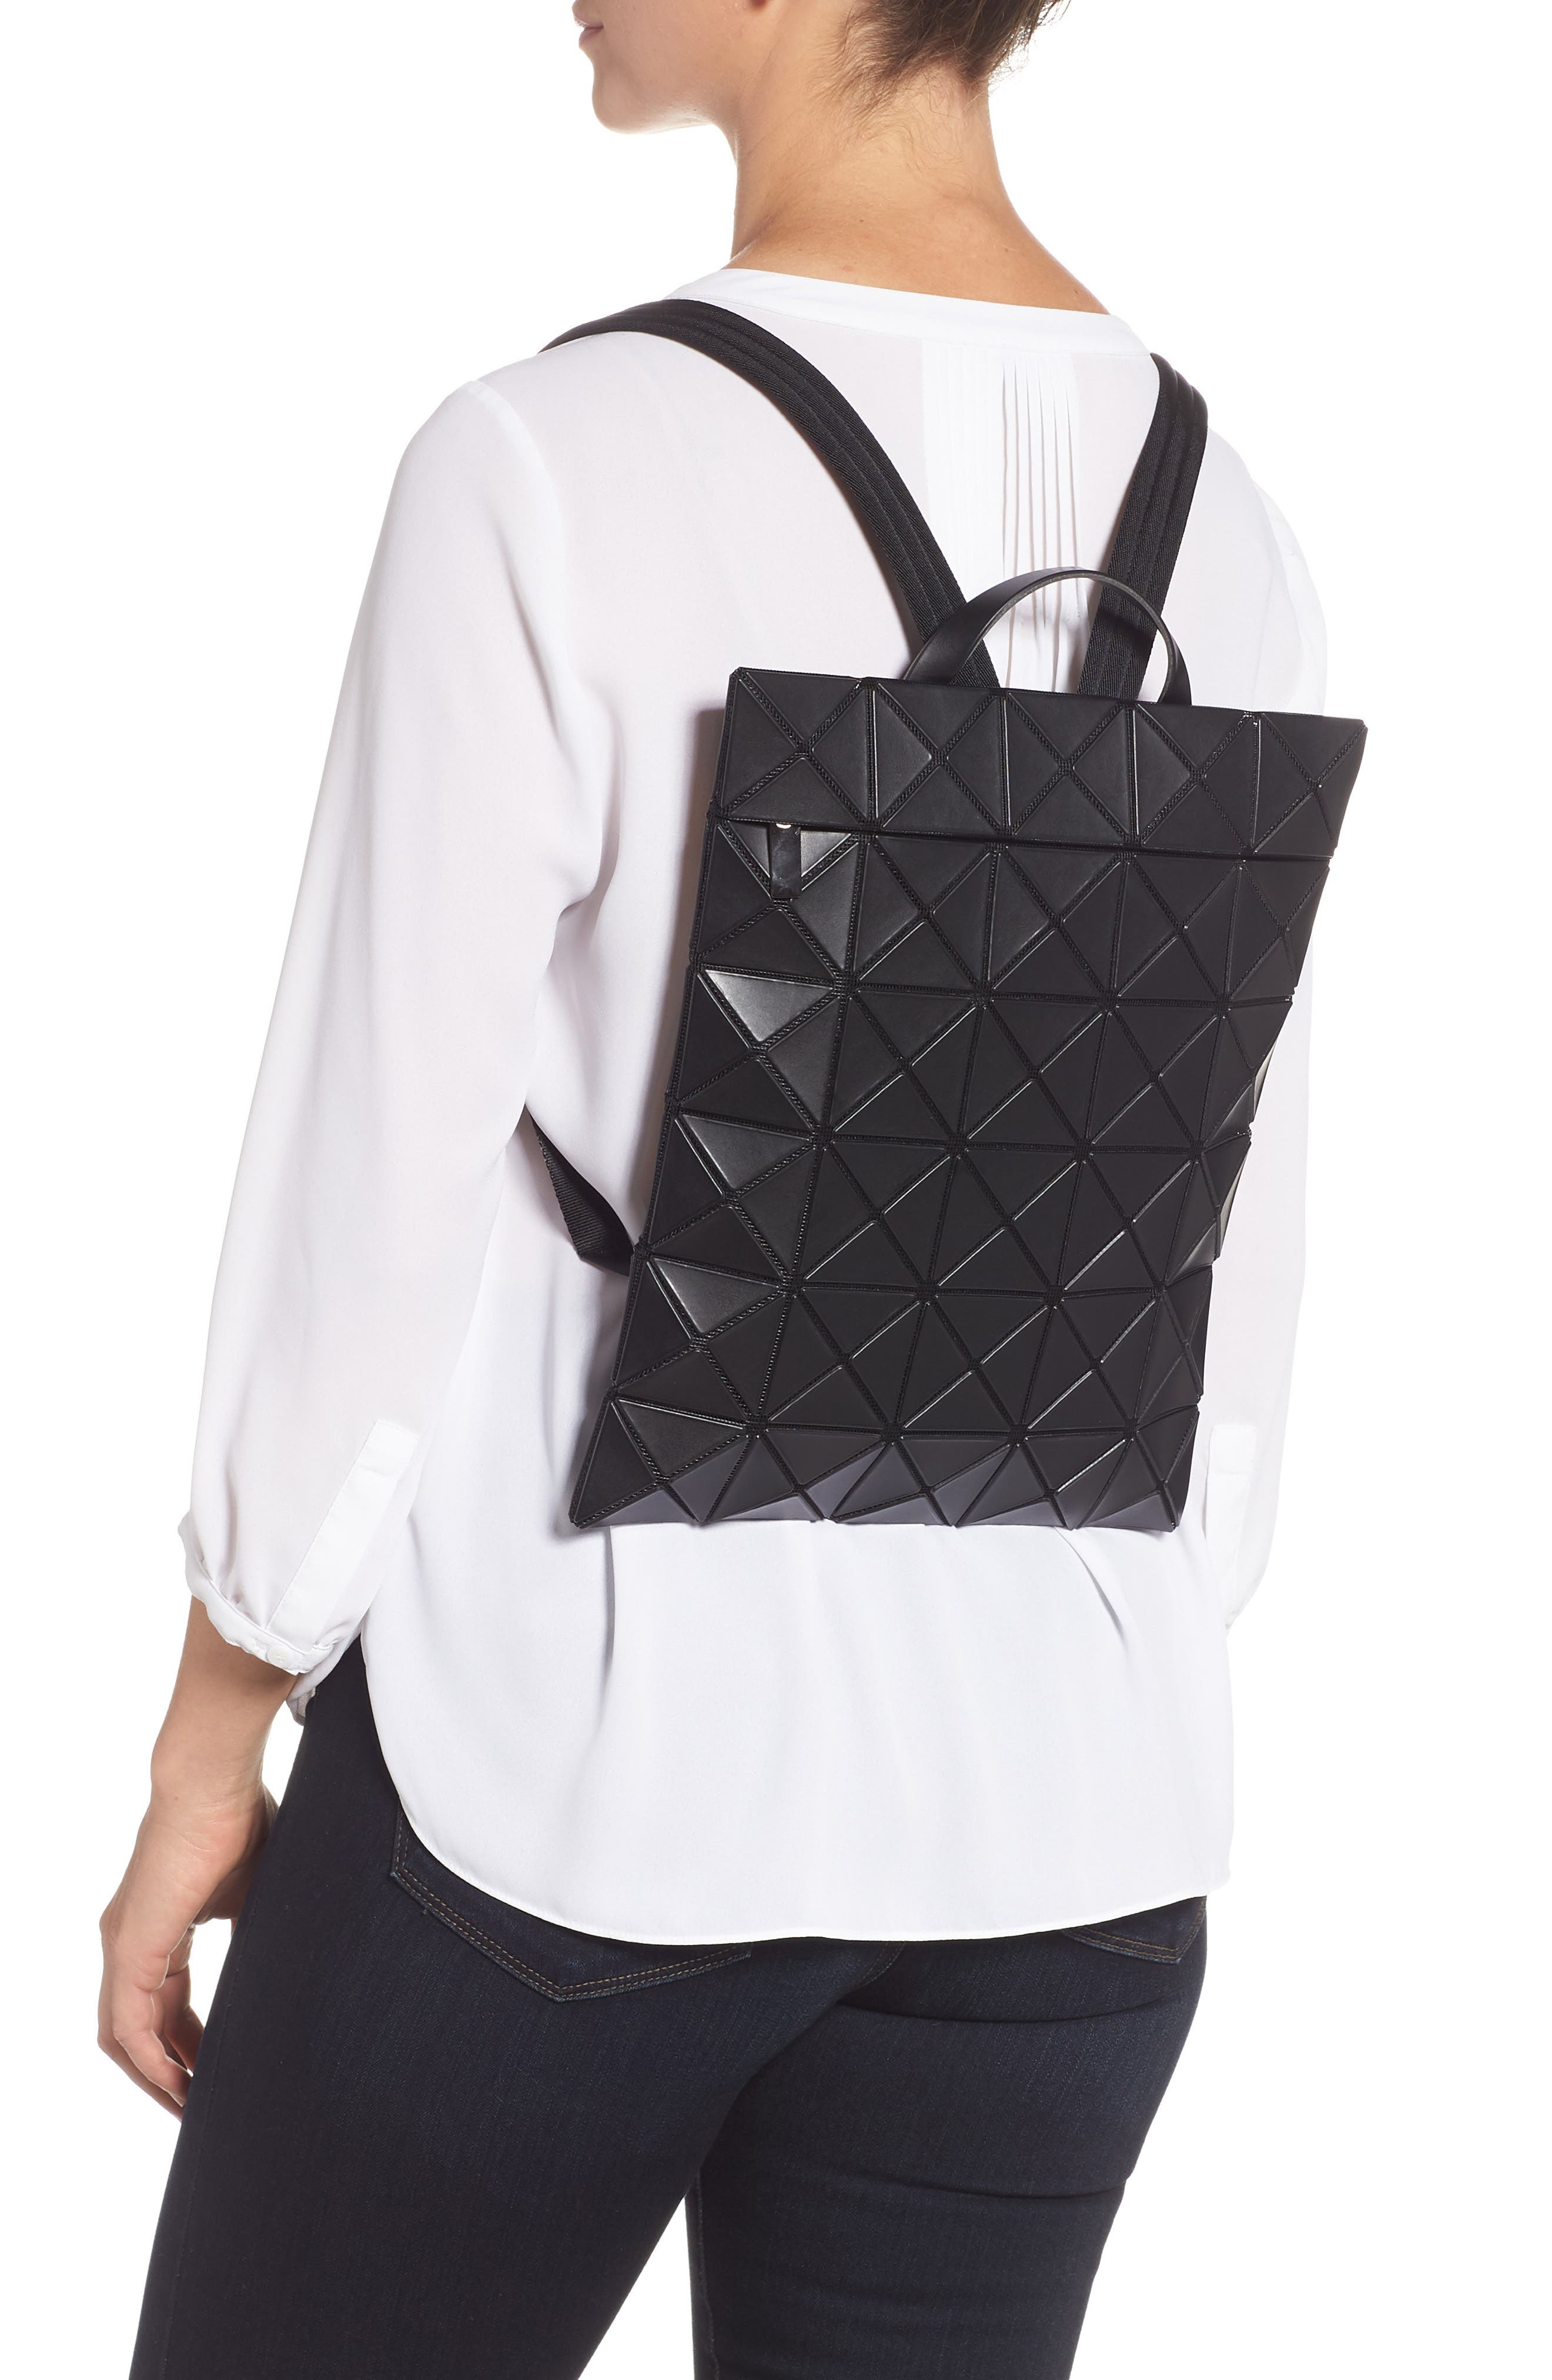 BAO BAO ISSEY MIYAKE,                             Flat Backpack,                             Alternate thumbnail 2, color,                             MATTE BLACK